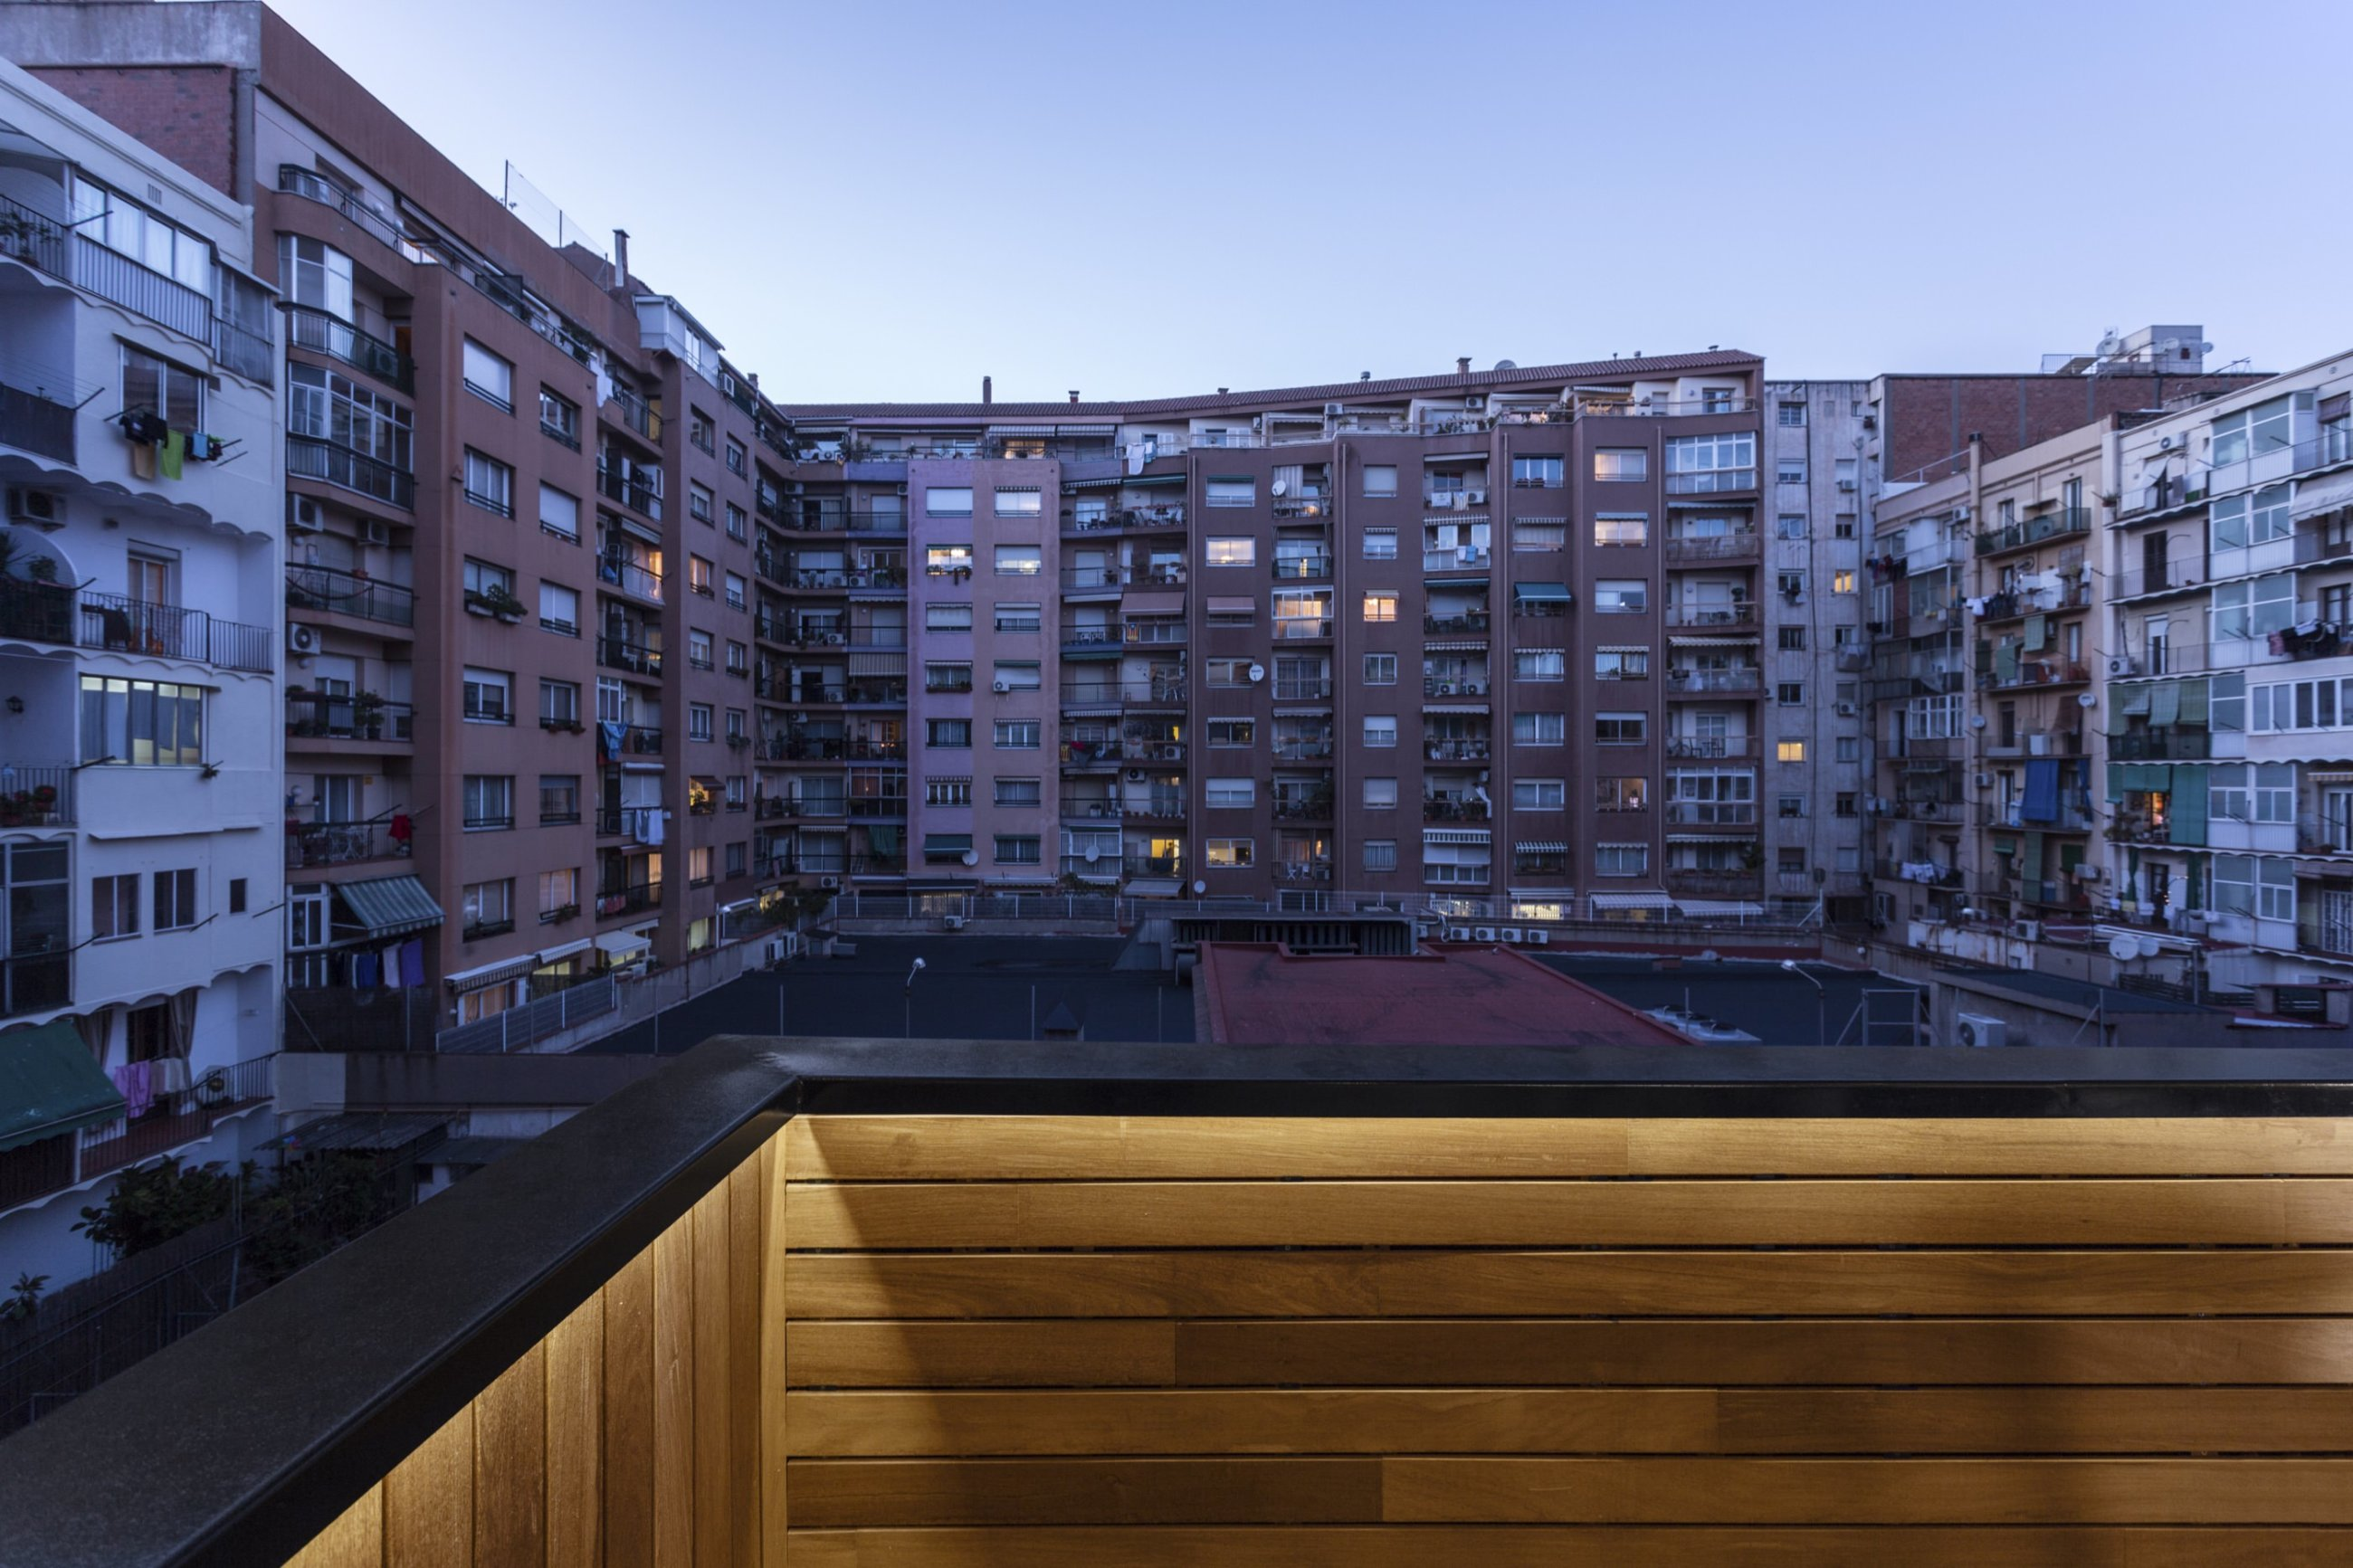 Apartamento Barcelona Arquitecto Paulo Martins 36 do fotografo Ivo Tavares Studio